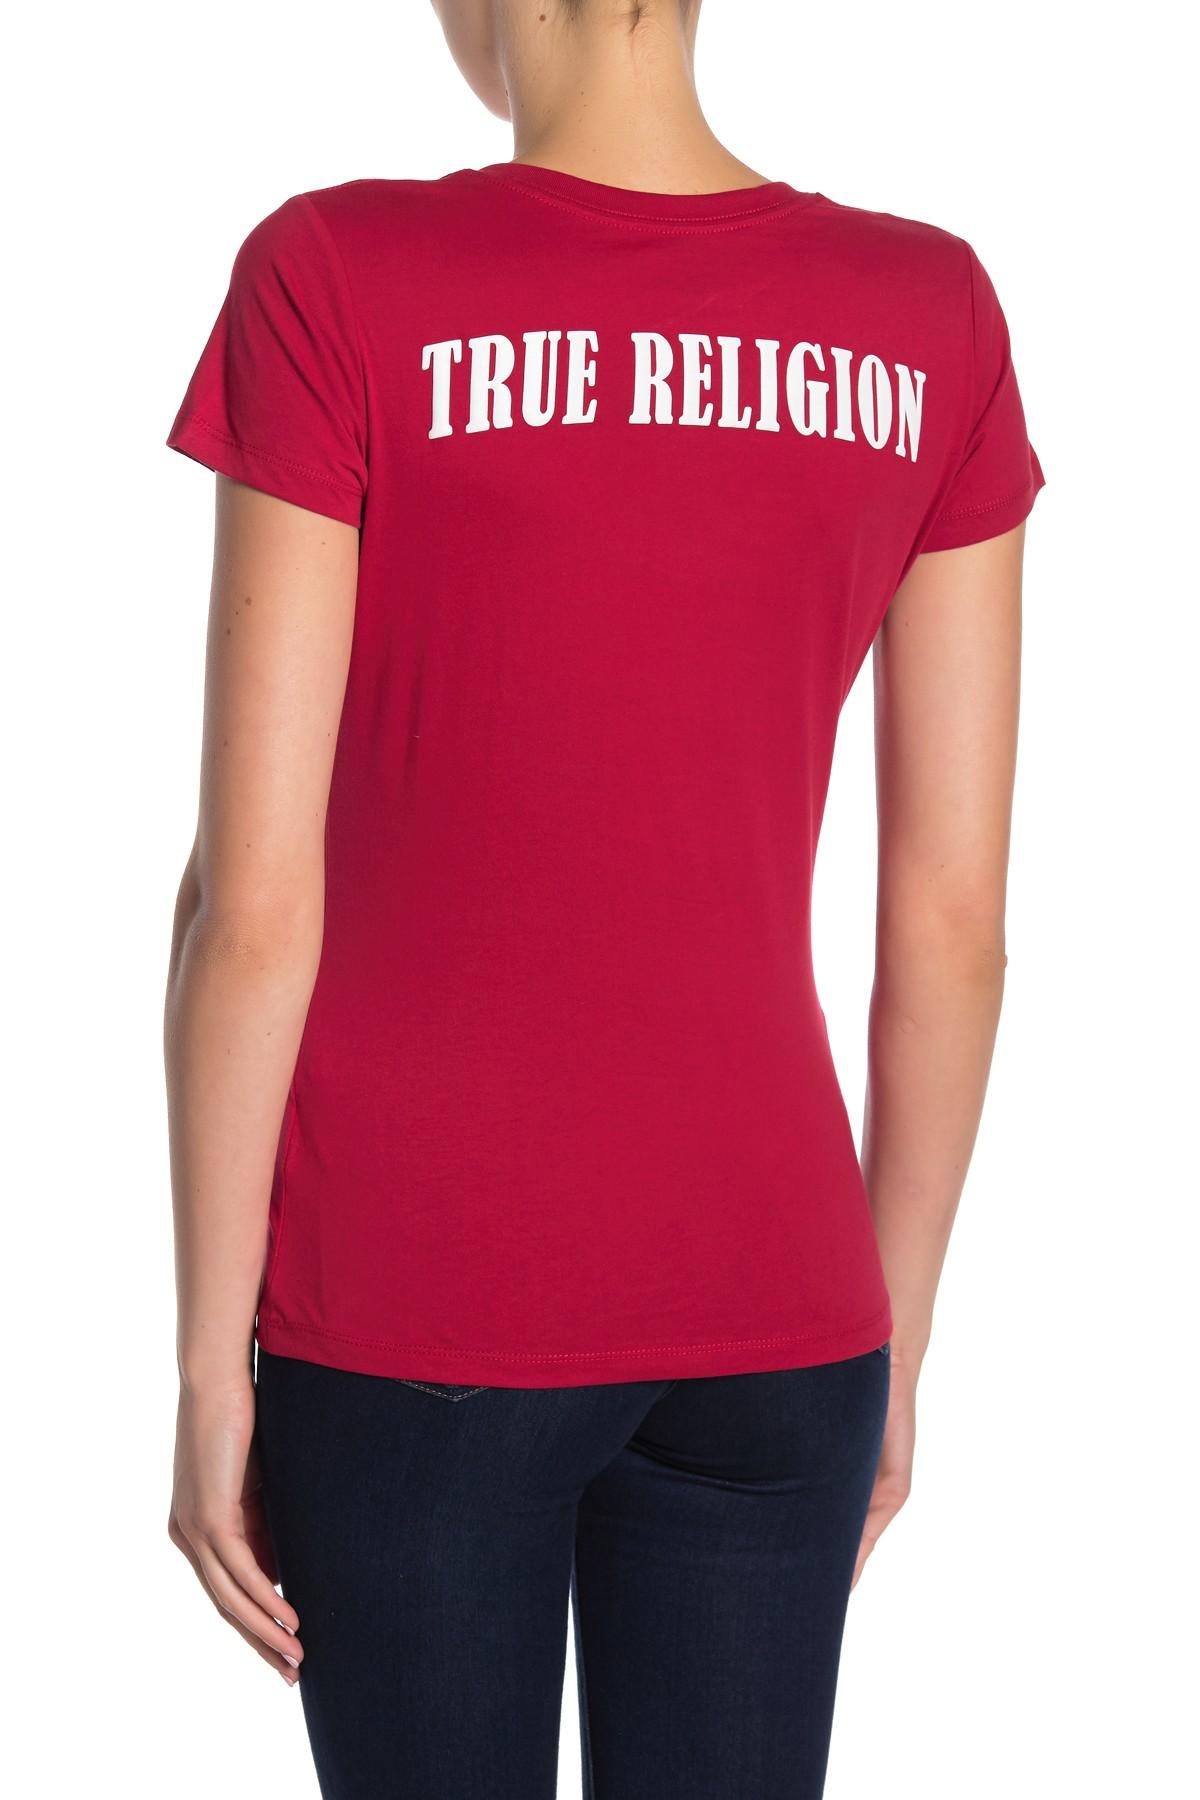 True-Religion-Women-039-s-Double-Puff-V-Neck-Tee-T-Shirt thumbnail 5